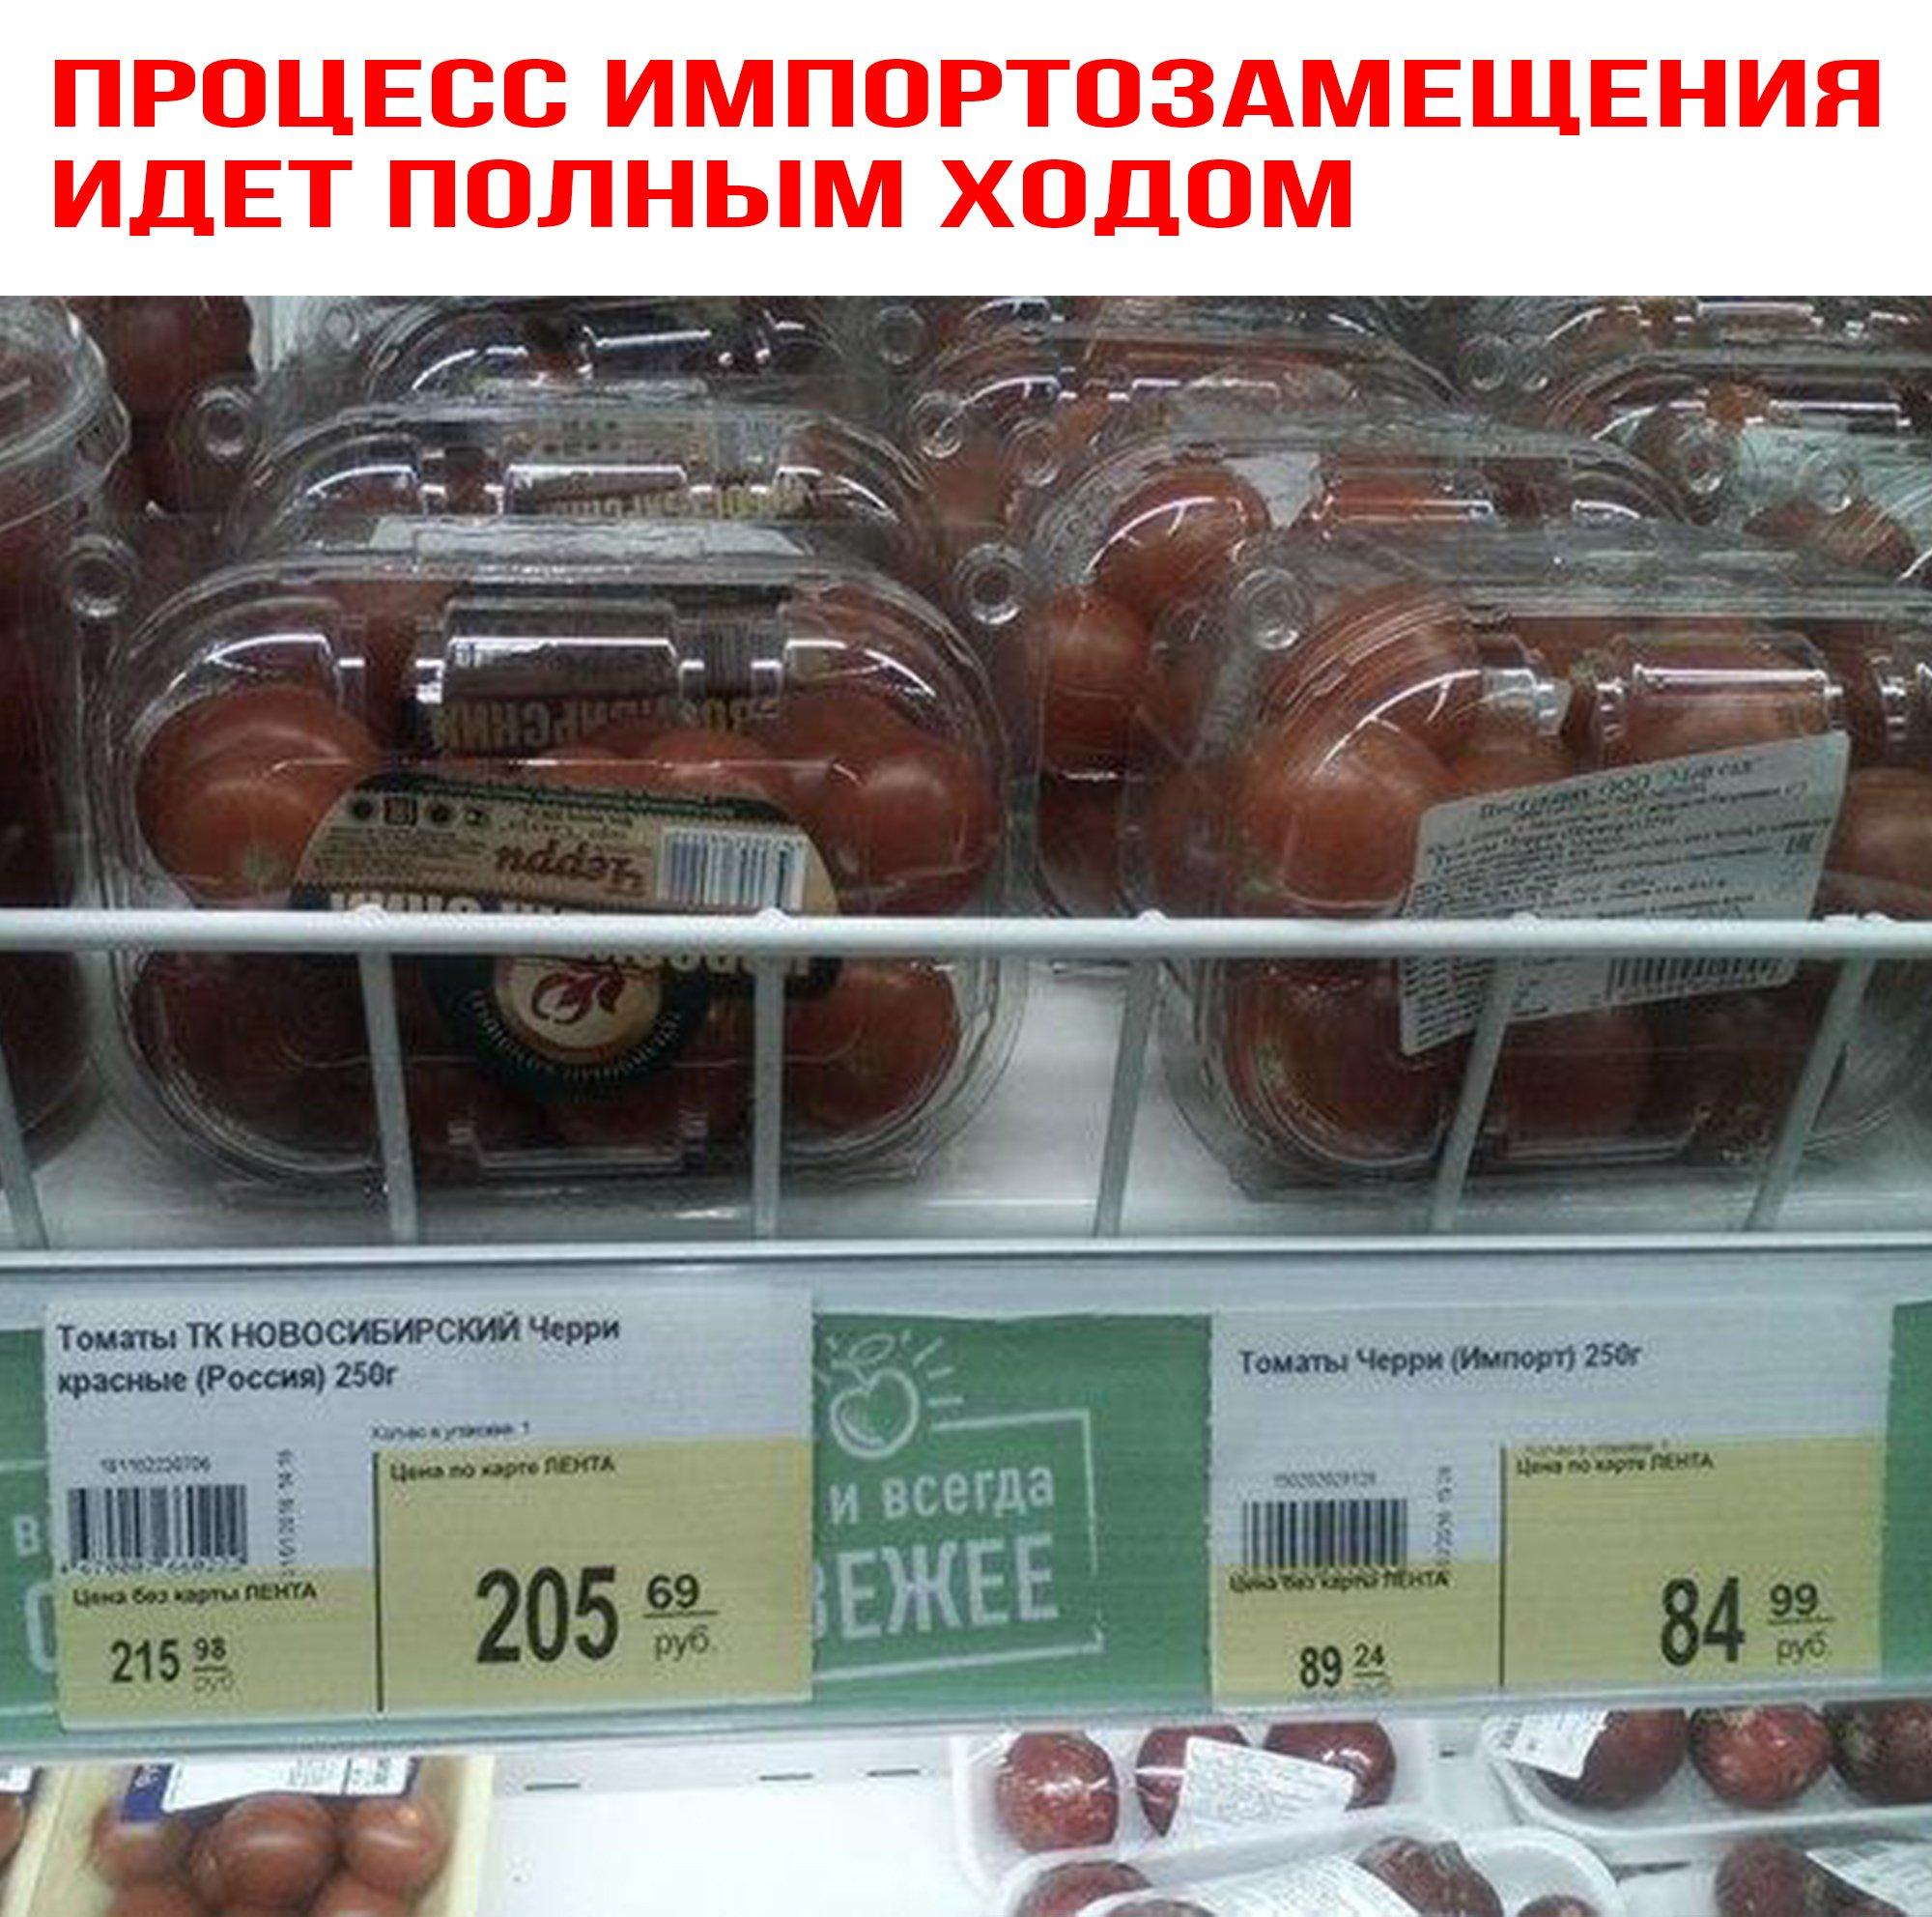 Импортозамещение по русски фото